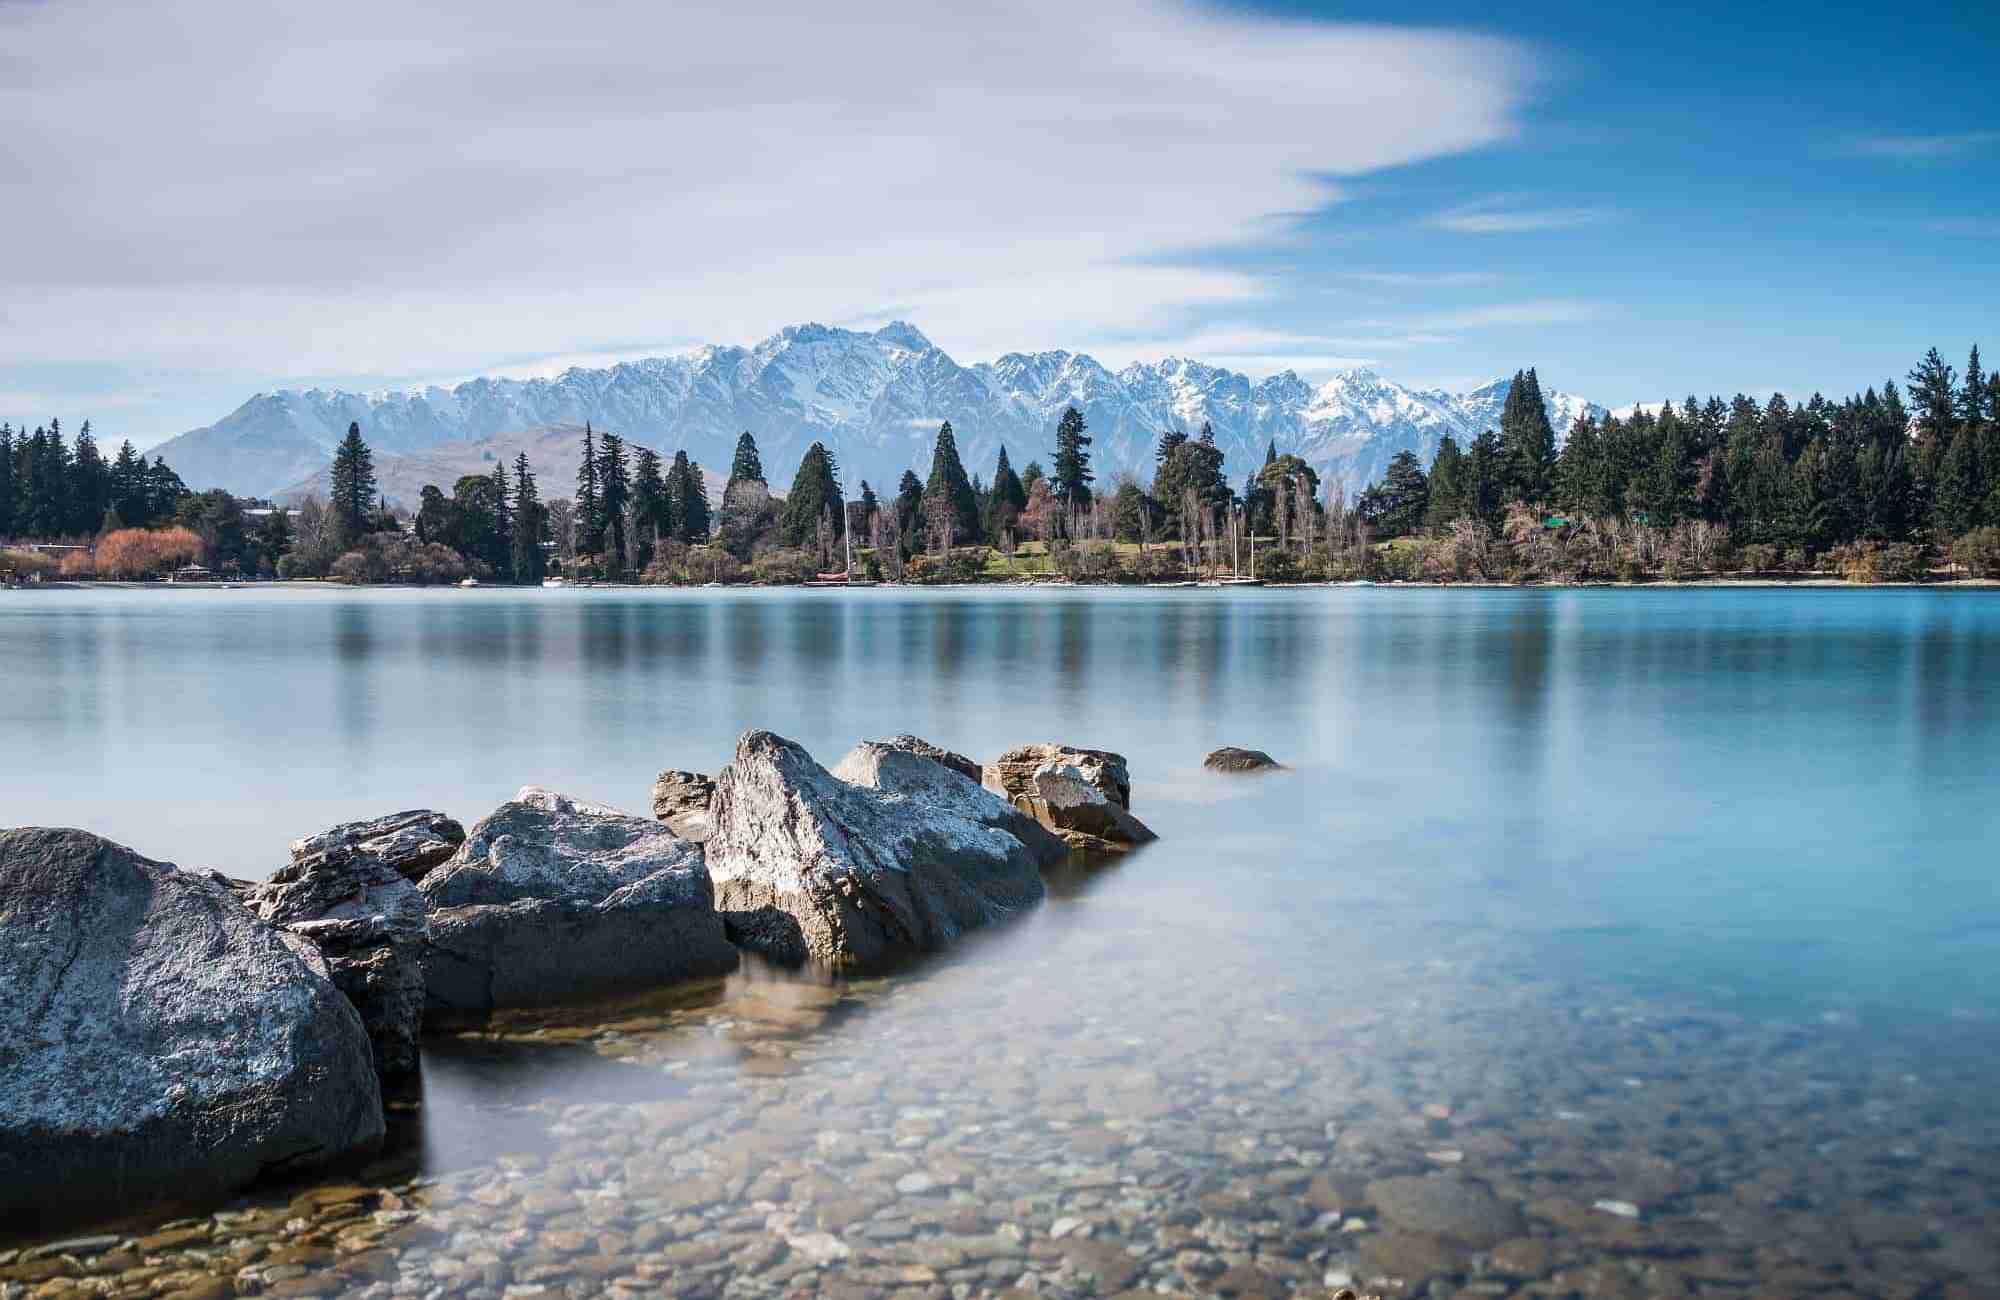 Voyage Nouvelle-Zélande - Lac Wakatipu - Amplitudes